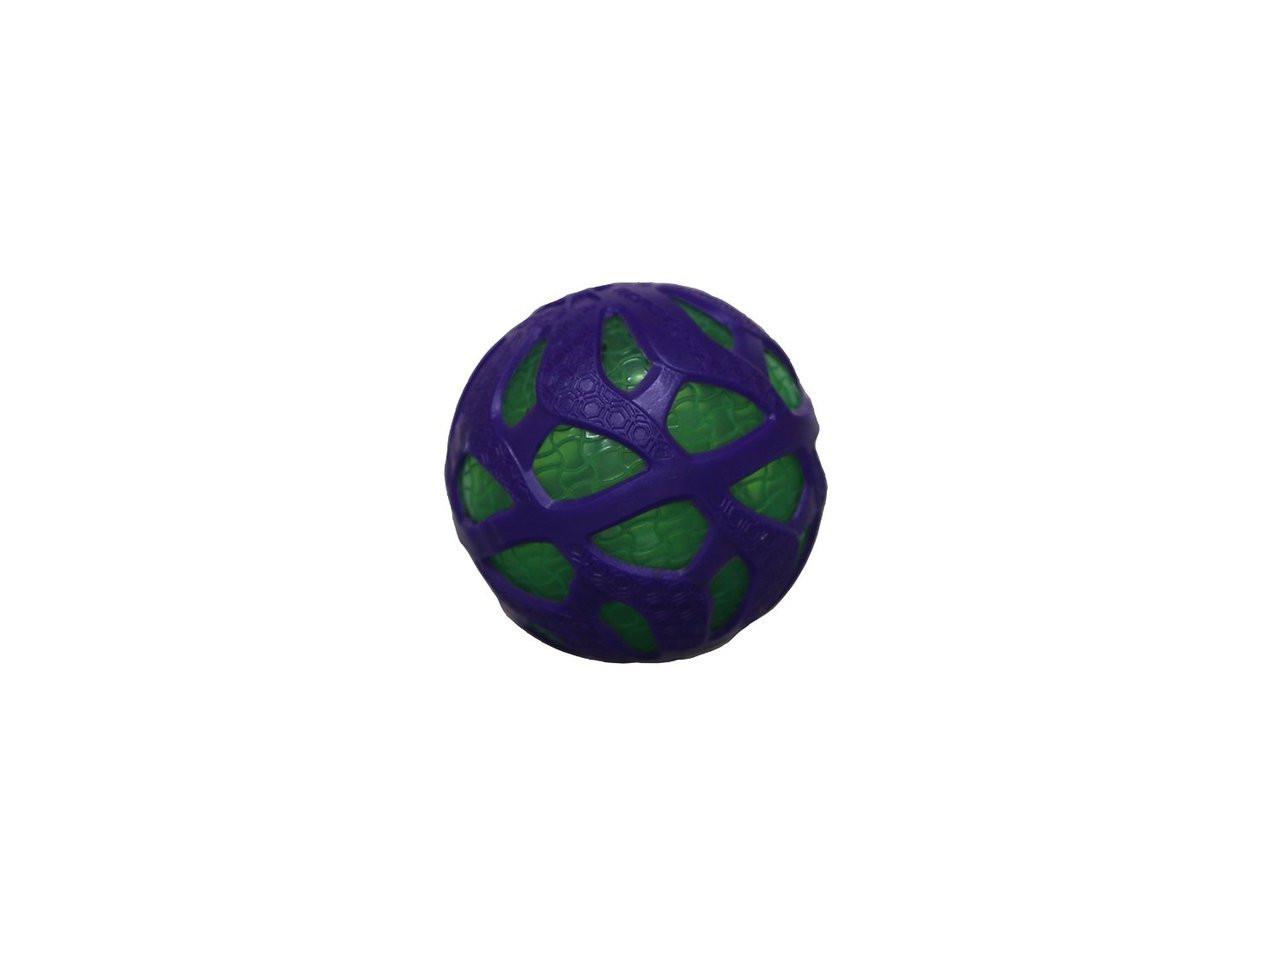 http://store-svx5q.mybigcommerce.com/product_images/web/795861345413.jpg